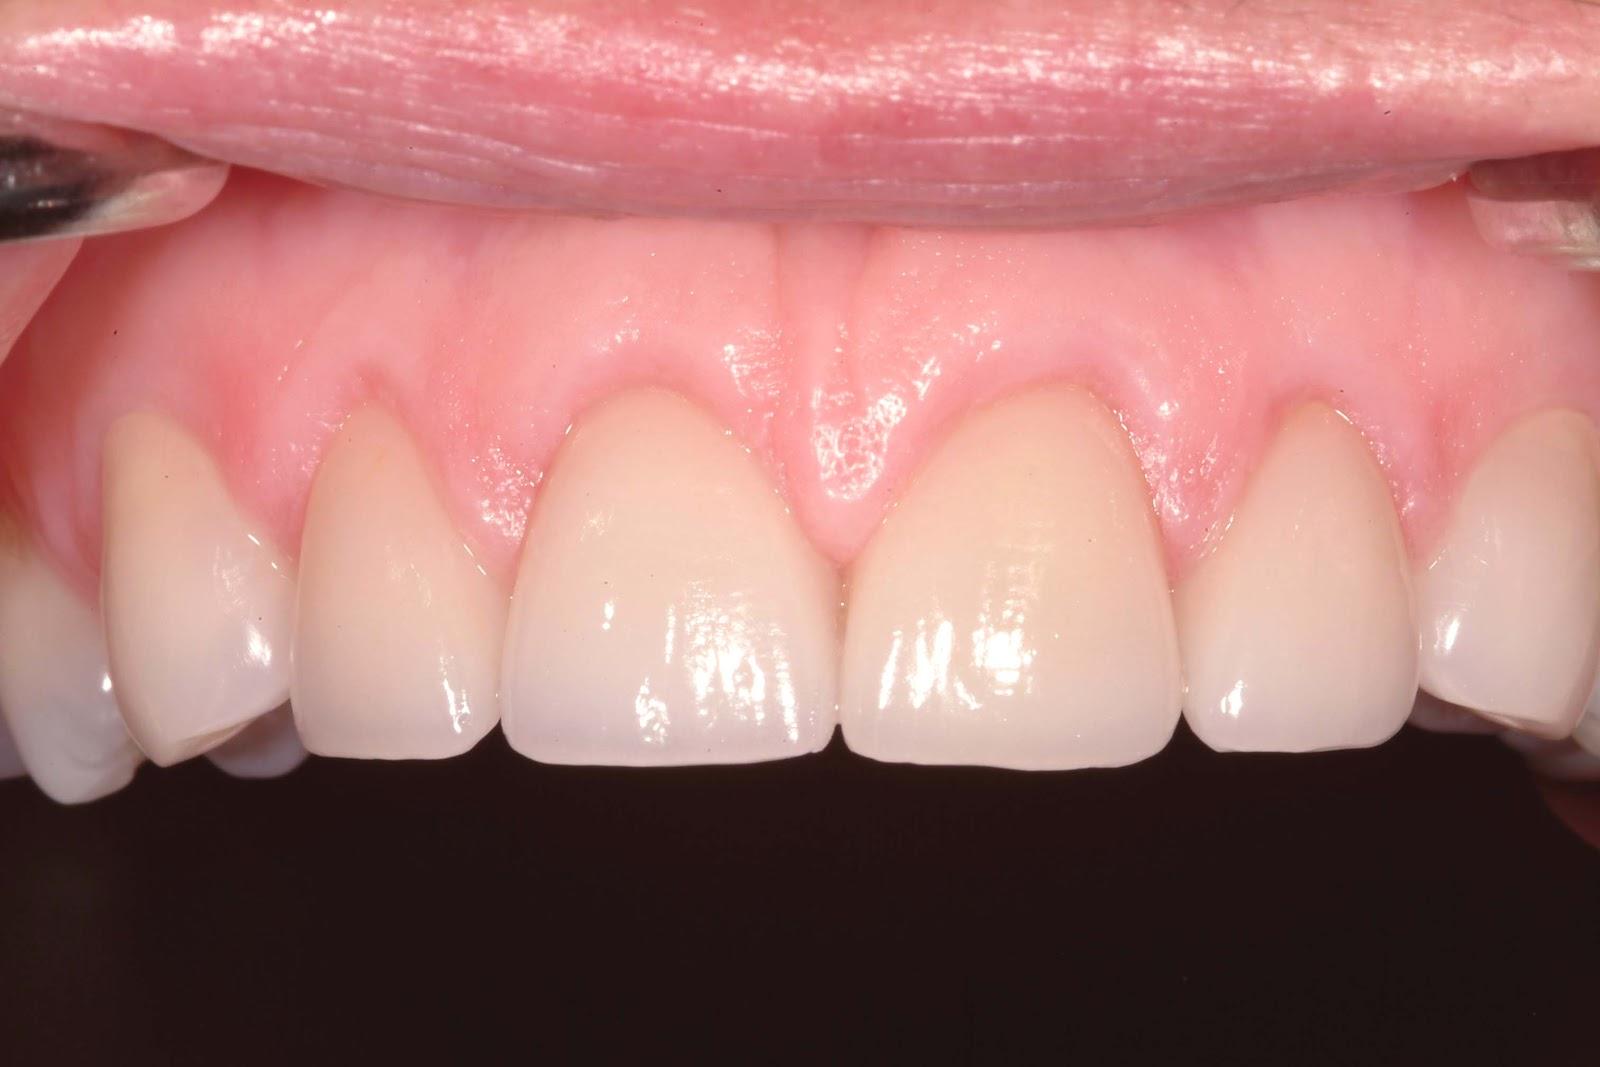 Gum teeth